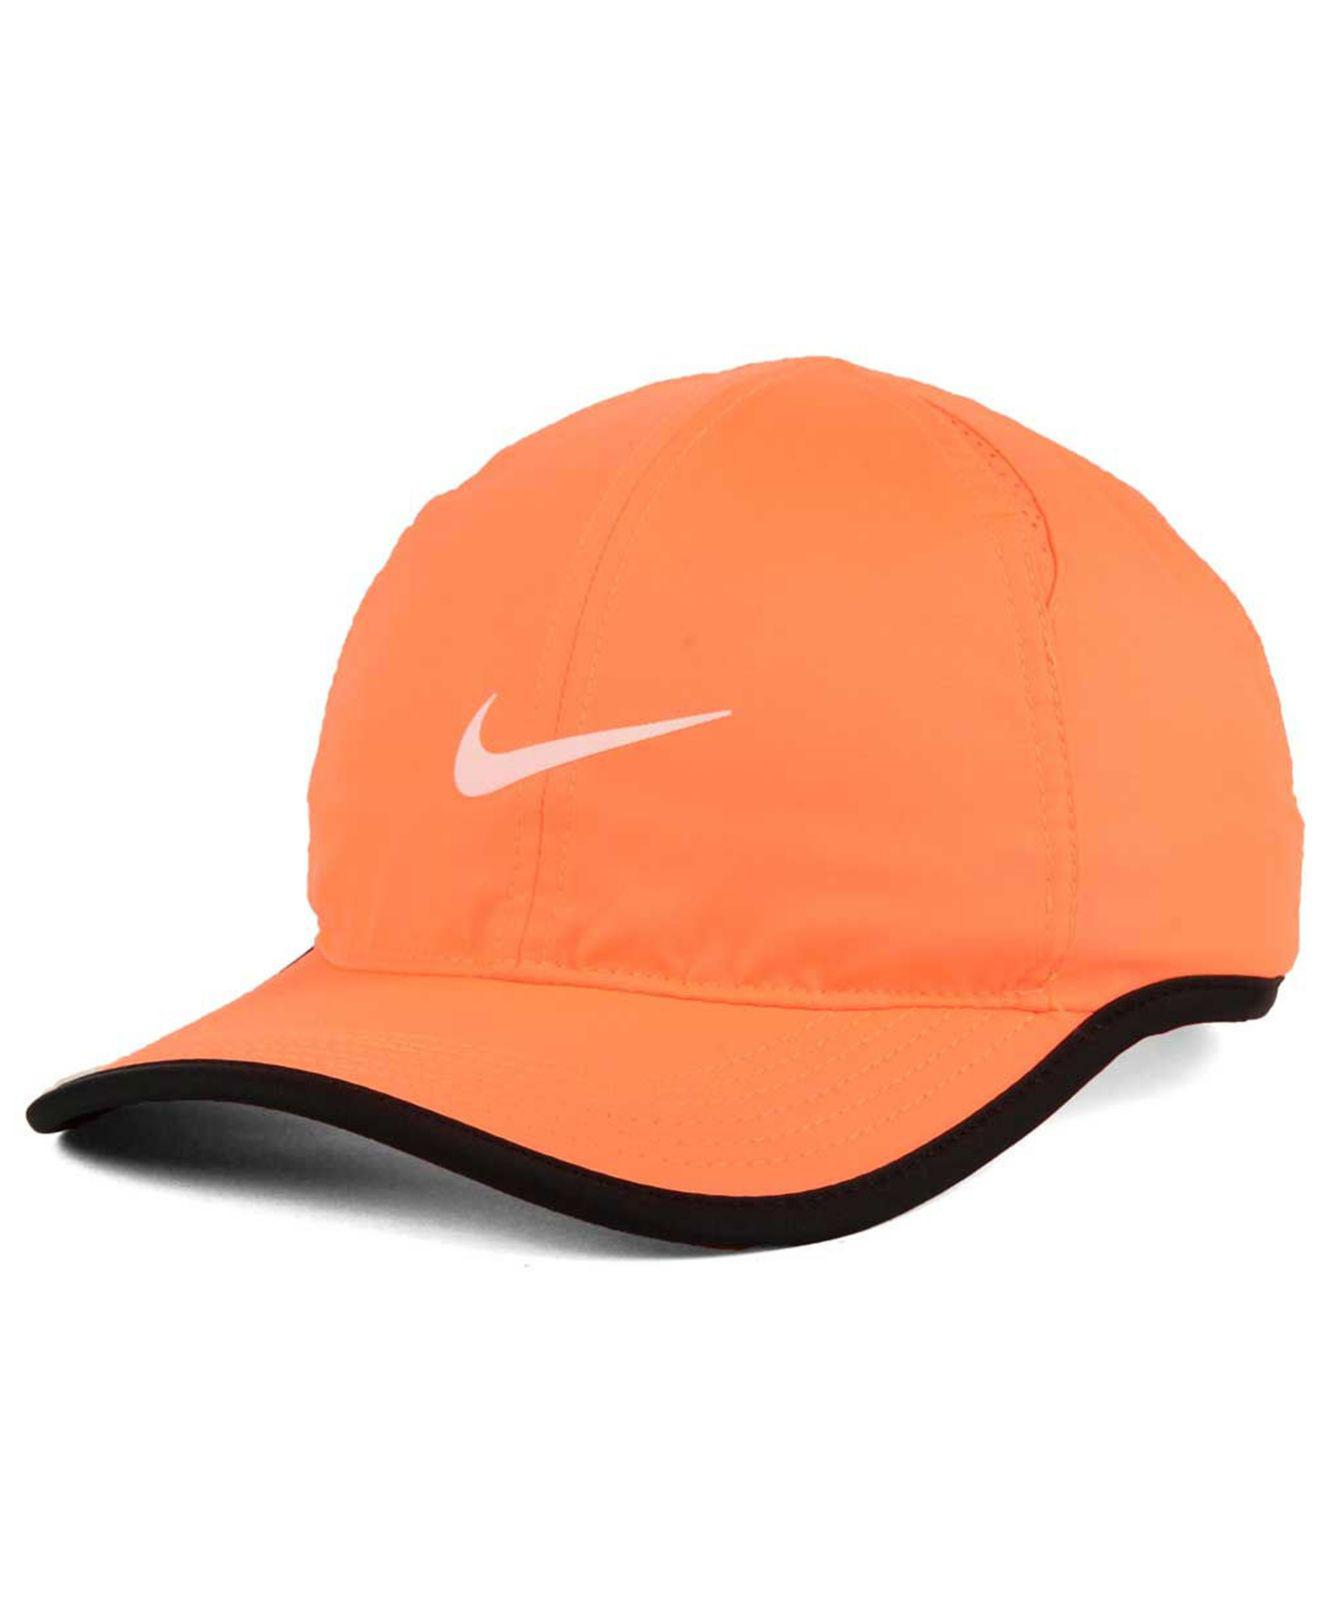 7f7e4b713e2ed Nike Featherlight Cap in Orange - Lyst